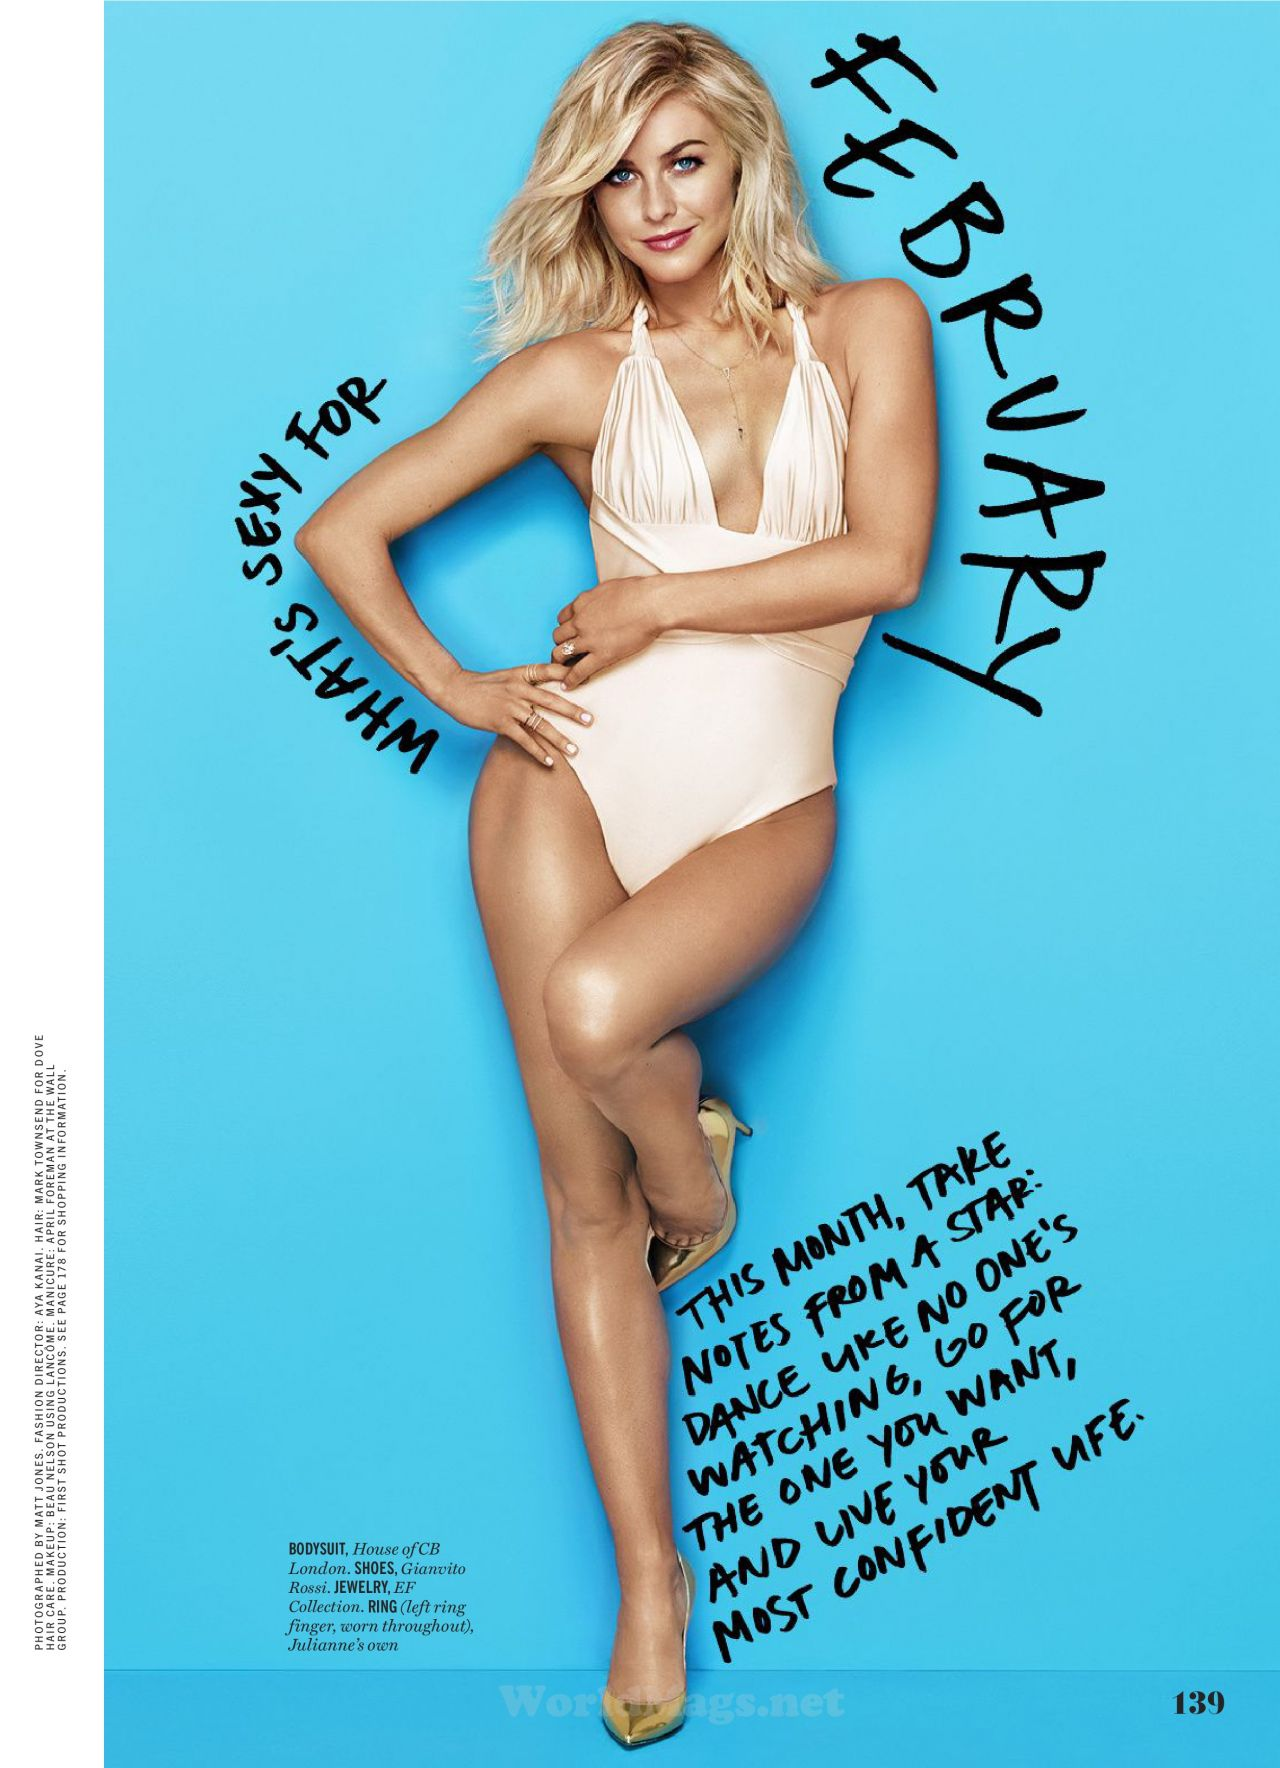 Julianne Hough Cosmopolitan Magazine February 2016 Issue